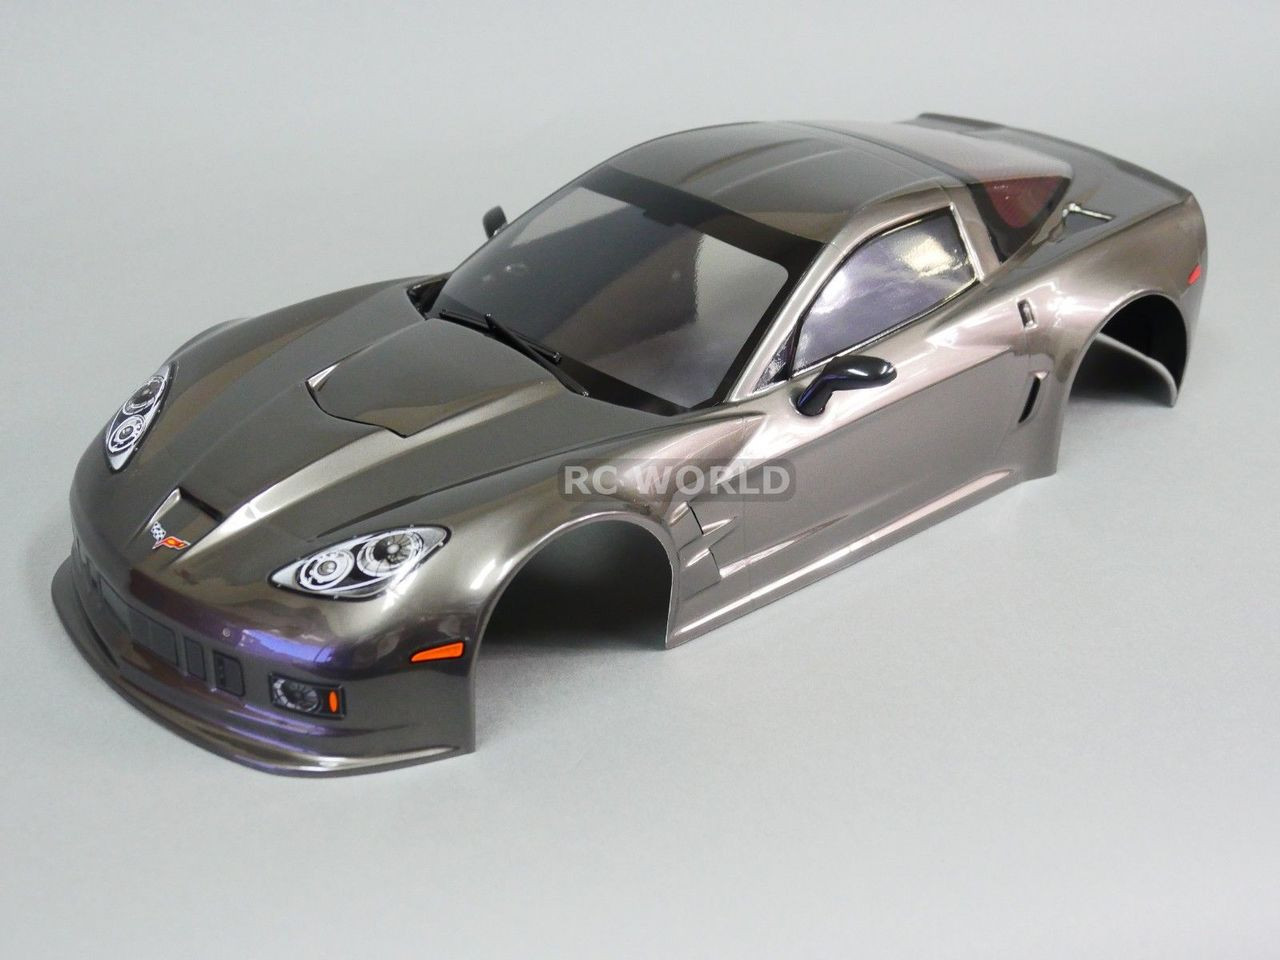 1 10 Rc Car Body Shell Chevy Corvette 190mm Gun Metal Finished Rc World